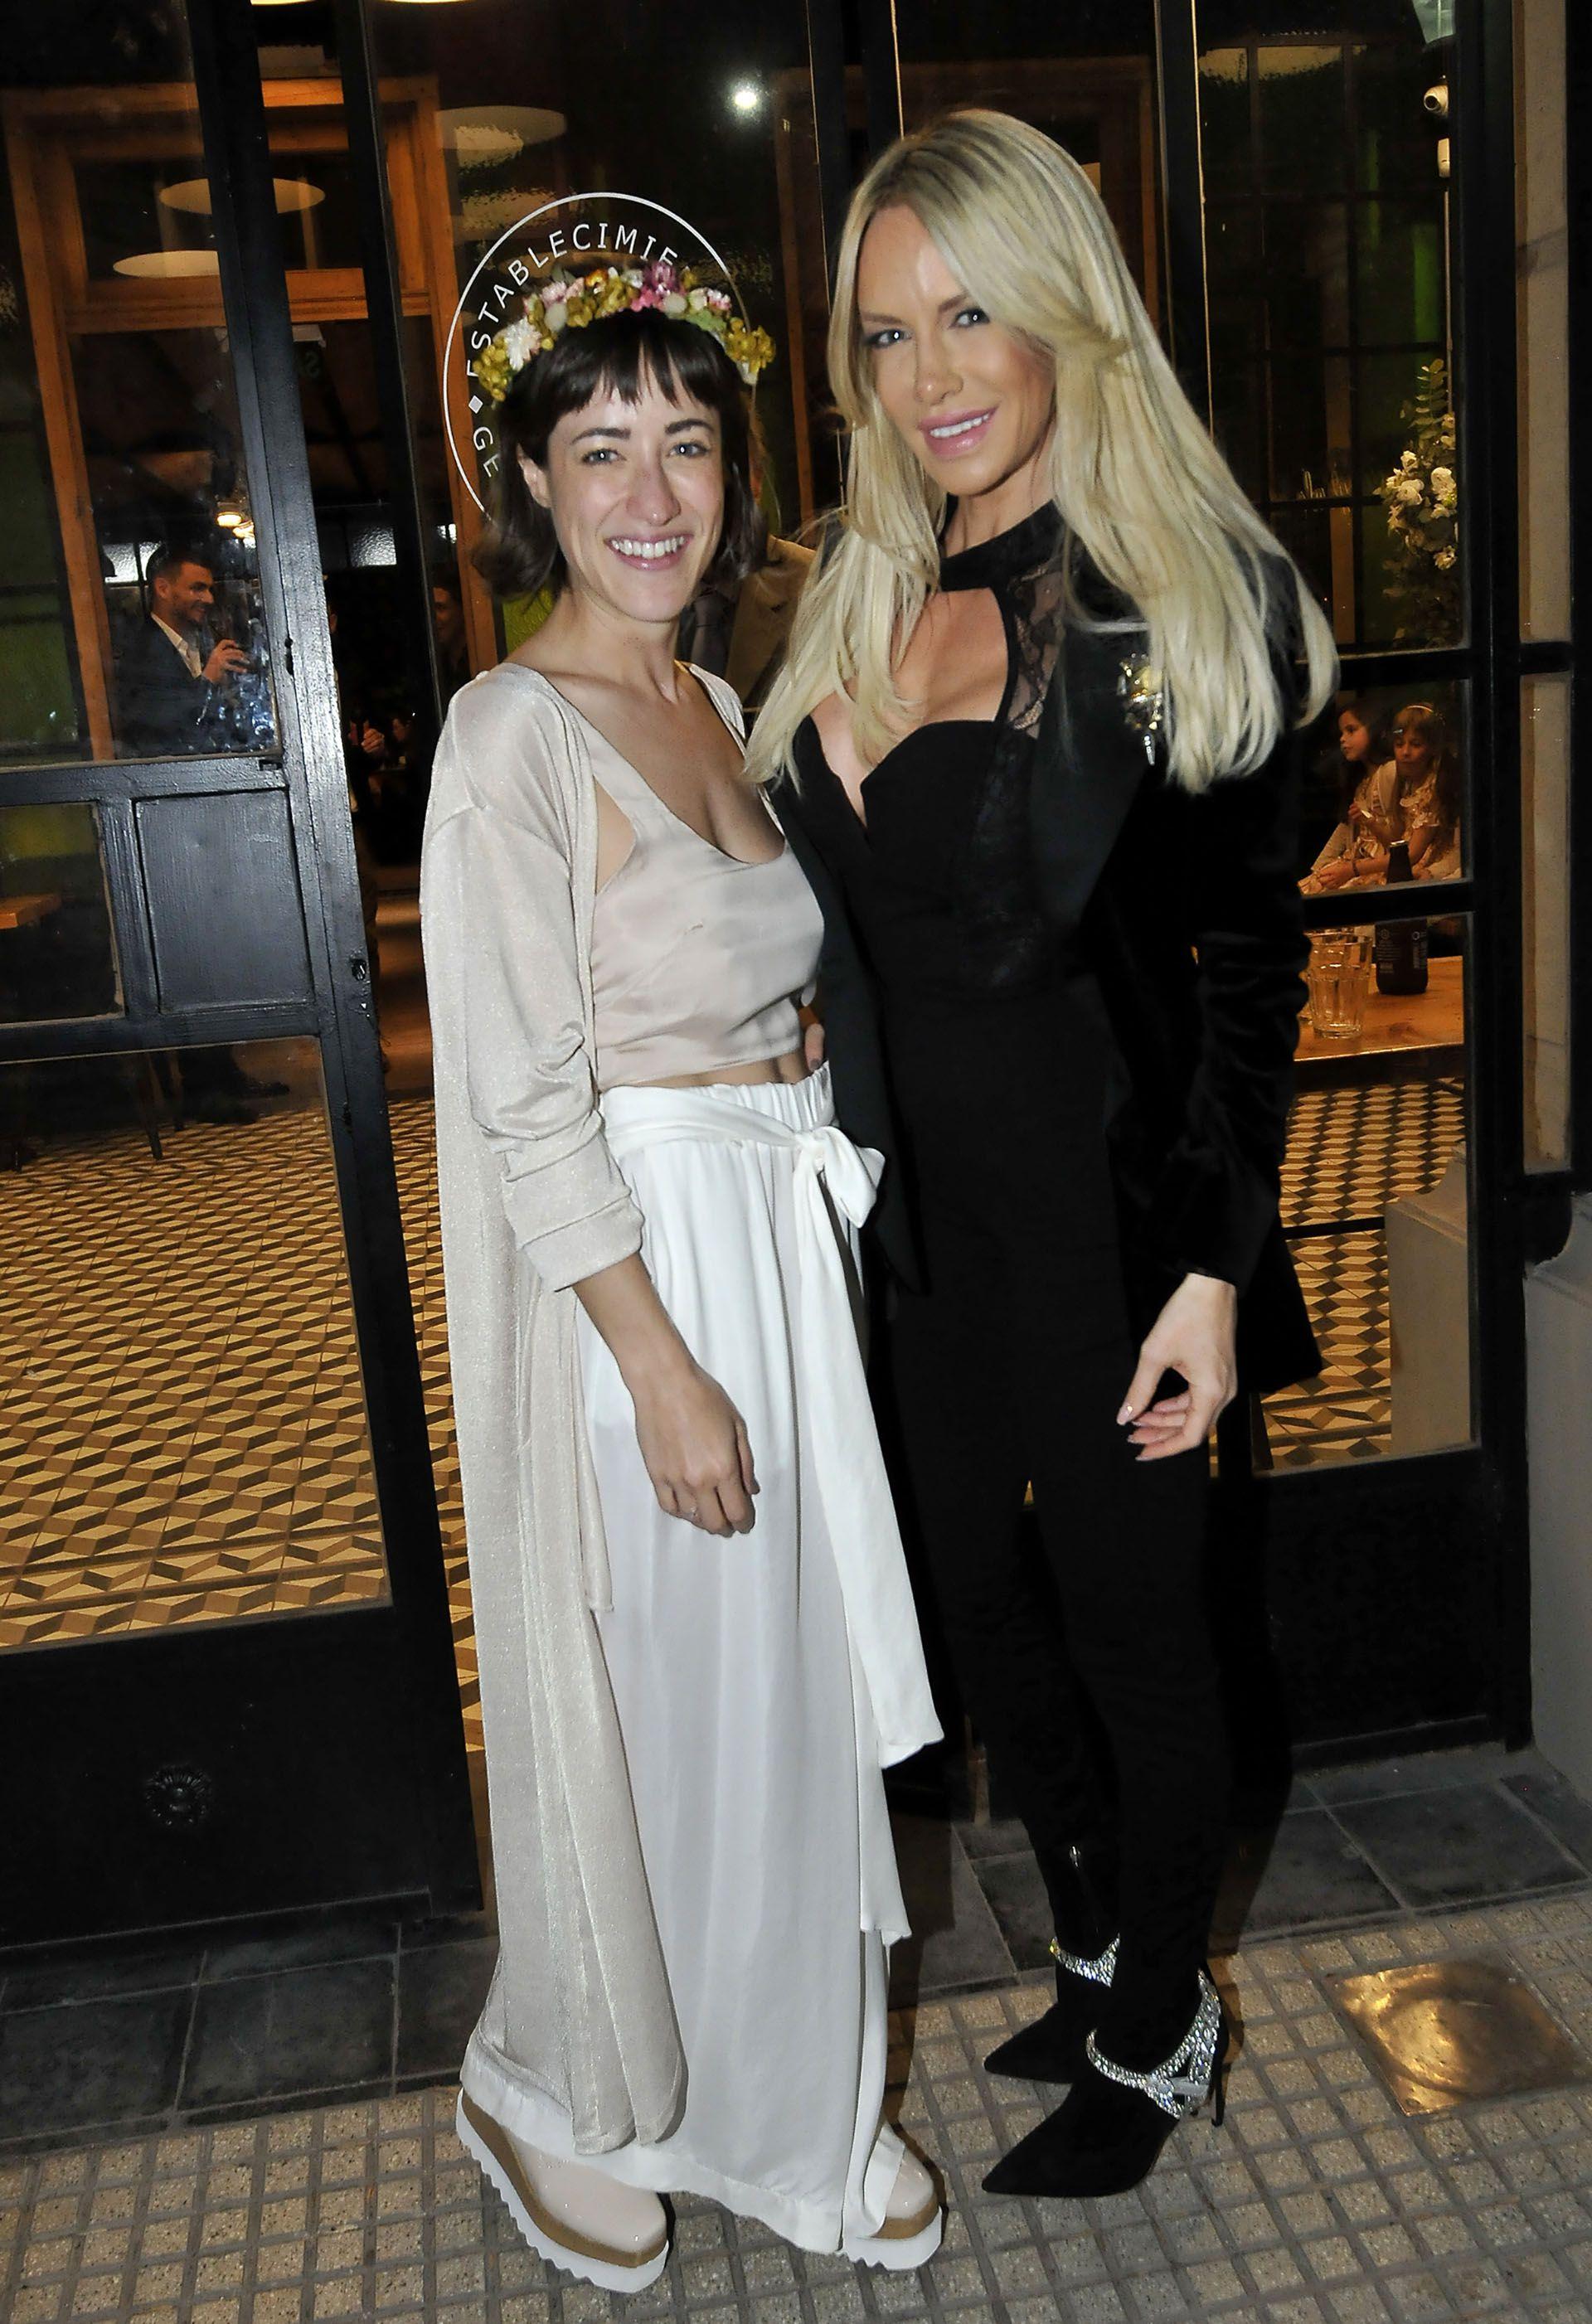 Camila y Luciana